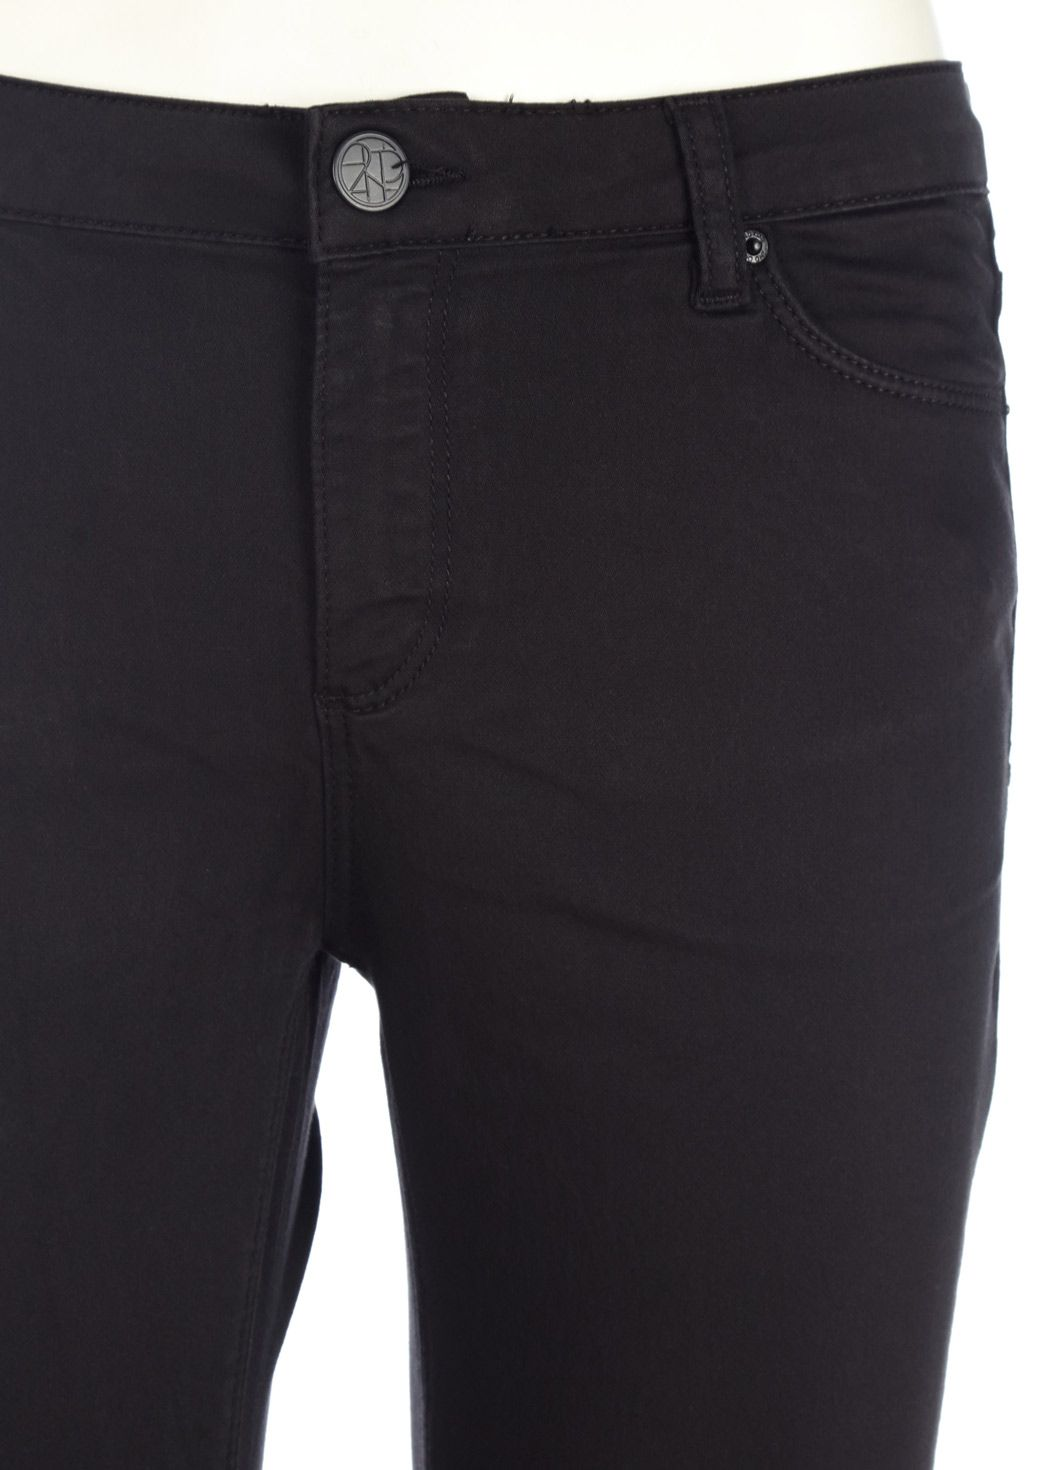 2nd One - Jeans - Nicole Zip - 006 Moon Black Satin